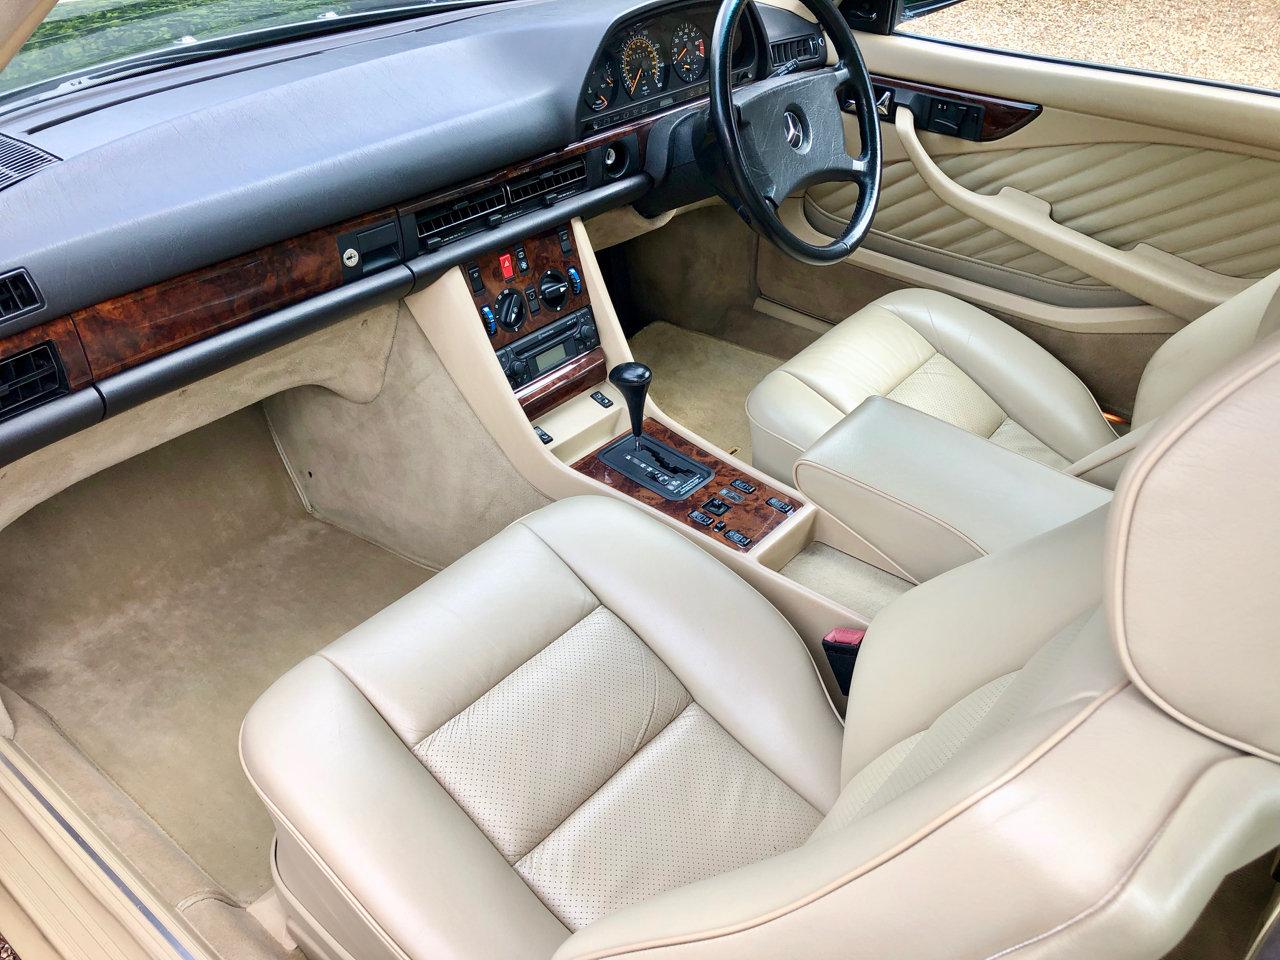 1992/J - Mercedes 420SEC C126 *SOLD* 560SEC 500 SEC For Sale (picture 4 of 6)